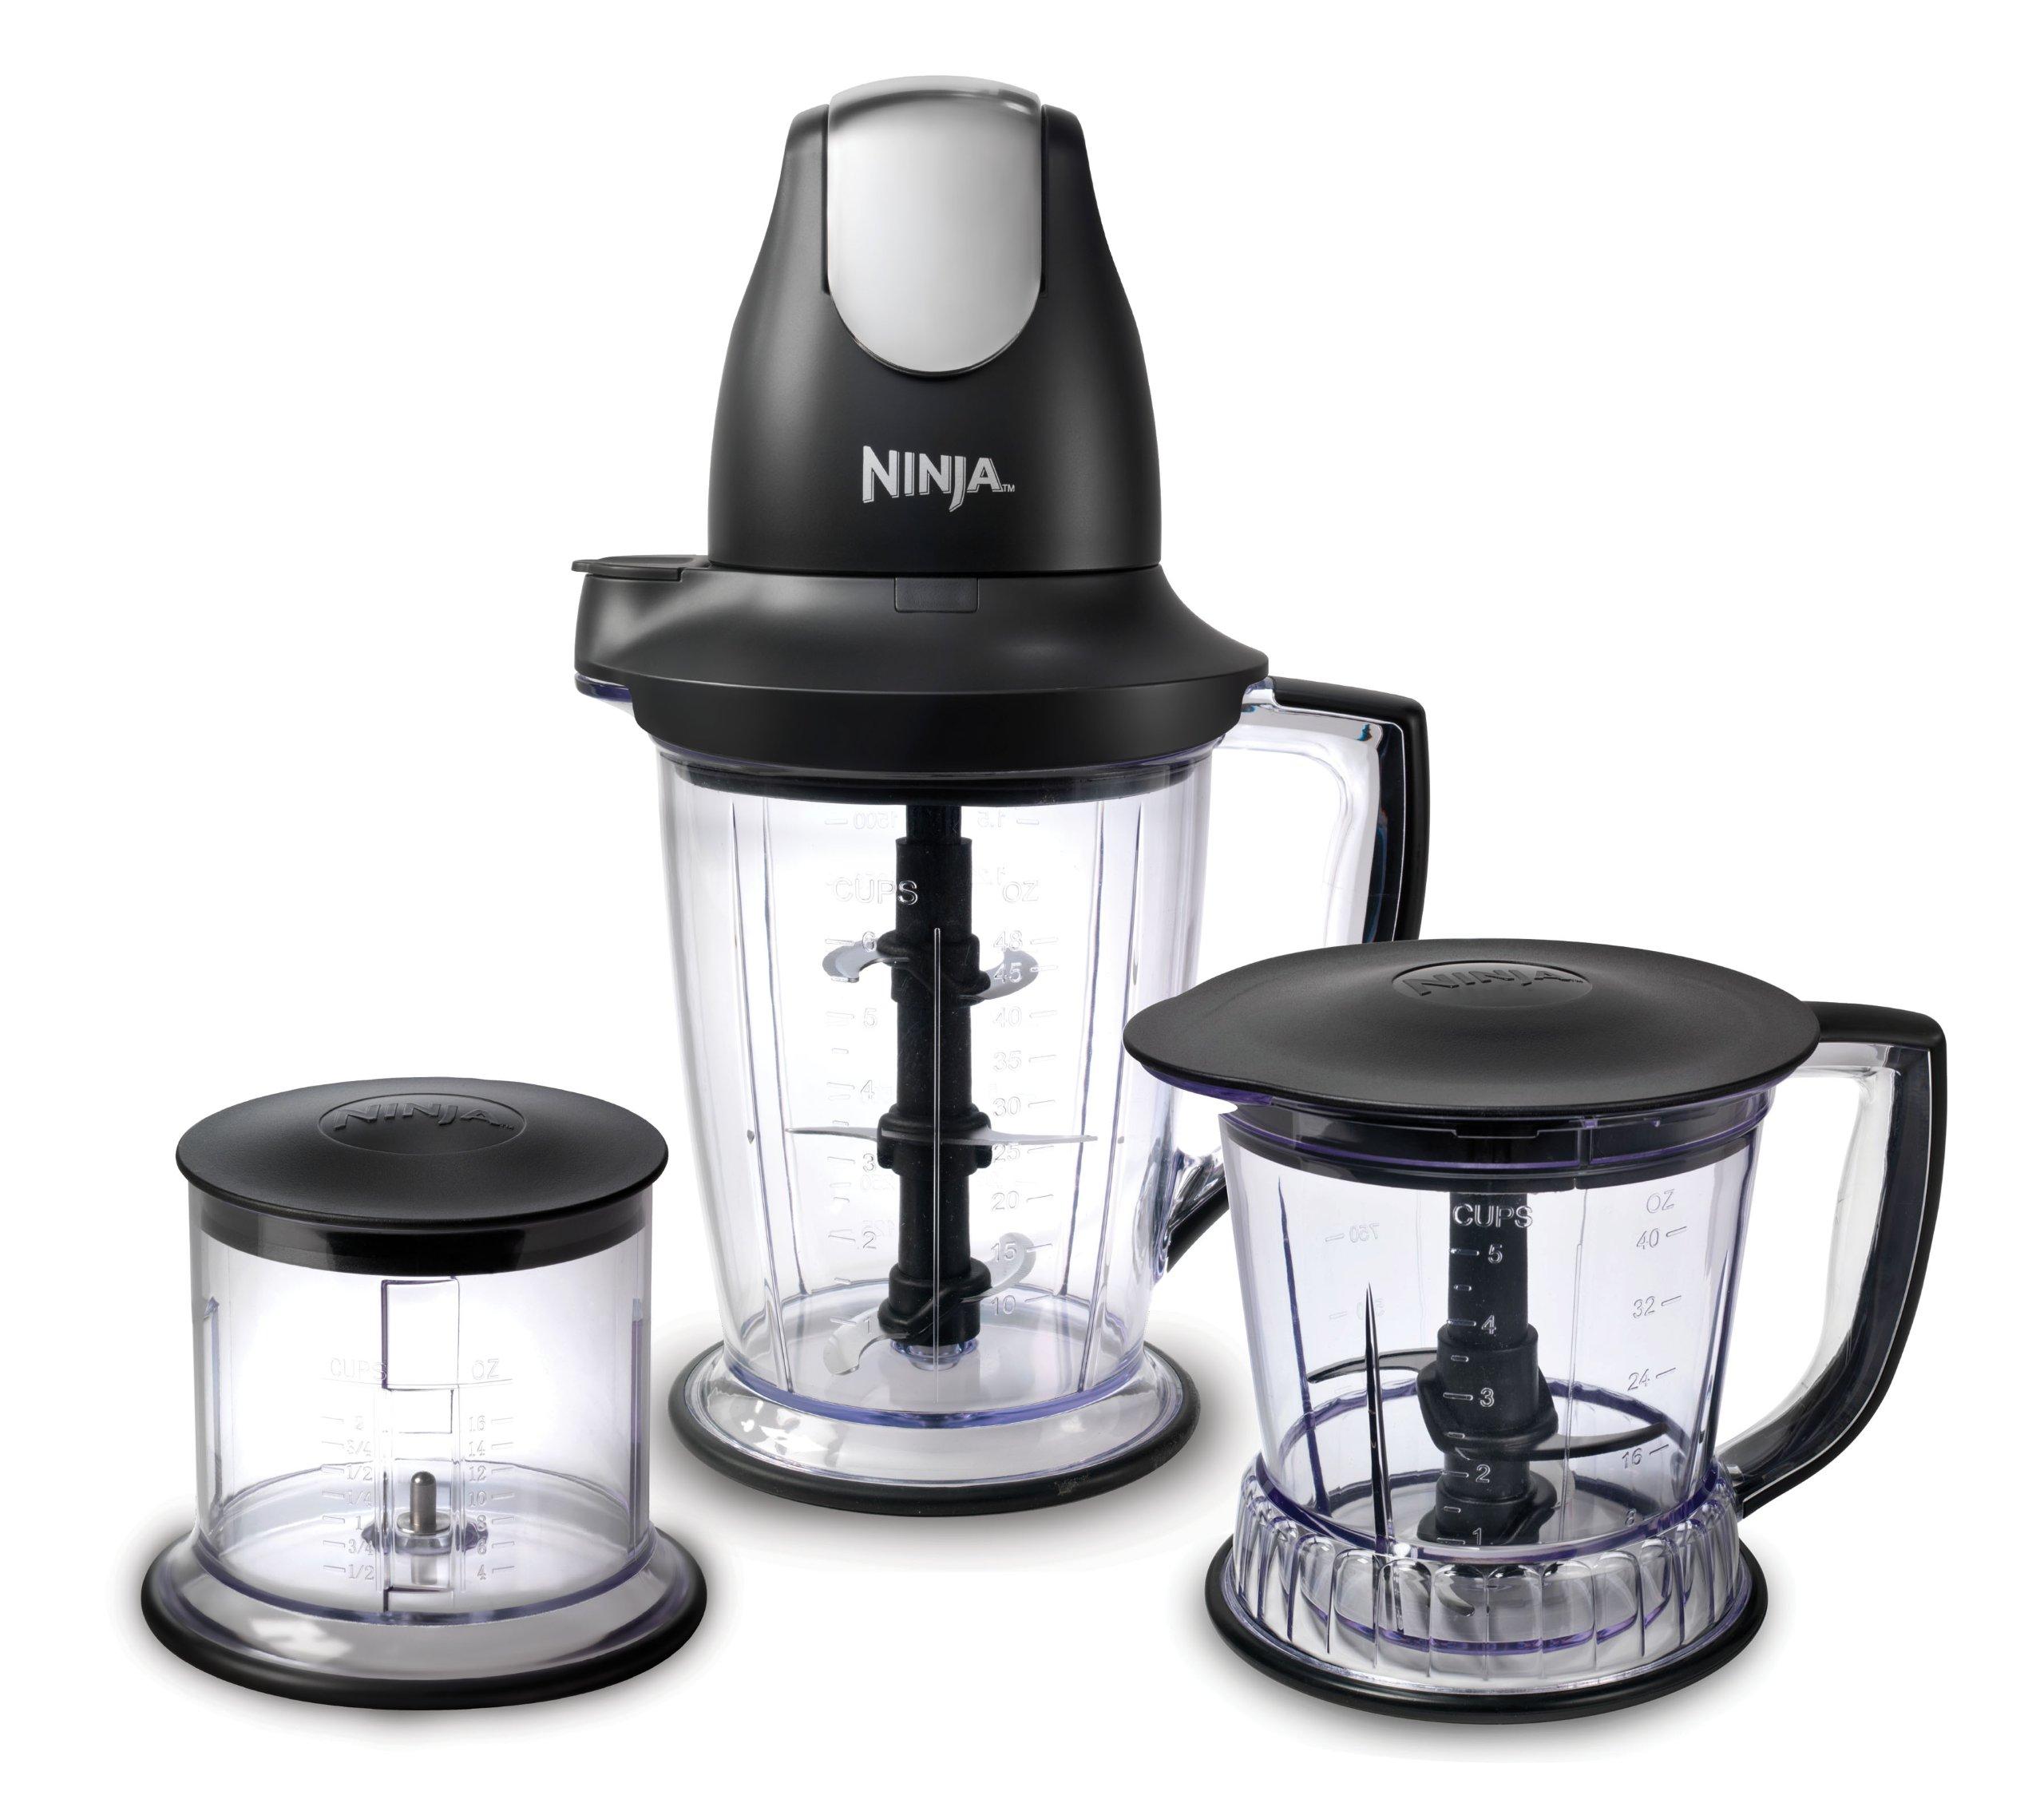 Ninja Blender/Food Processor with 450-Watt Base, 48oz Pitcher, 16oz Chopper Bowl, and 40oz Processor Bowl for Shakes…